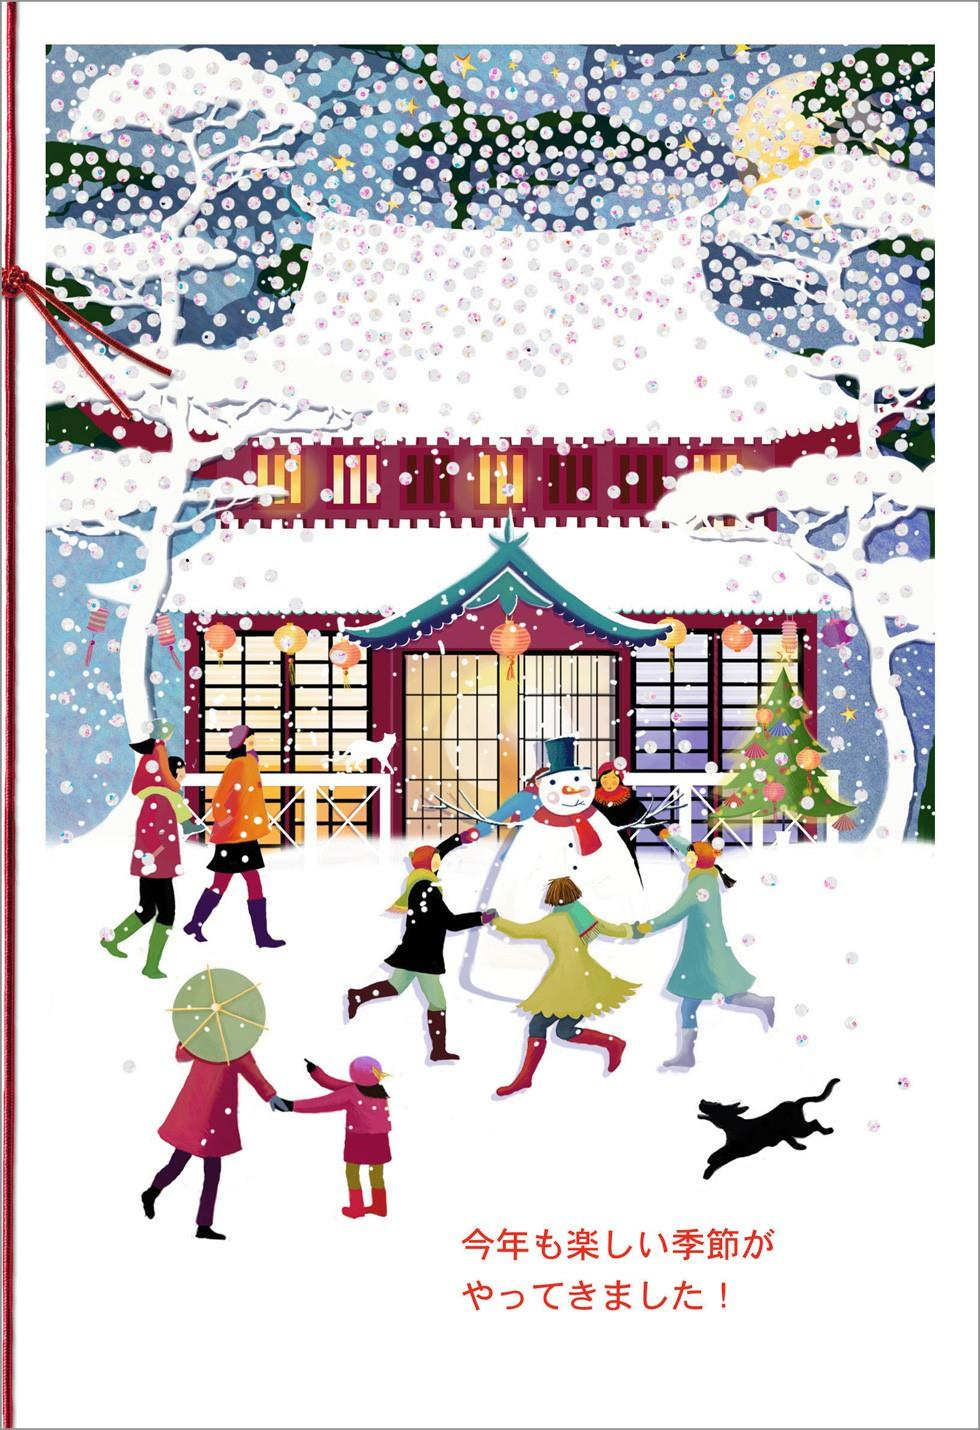 Joyous scene japanese language christmas card greeting cards joyous scene japanese language christmas card m4hsunfo